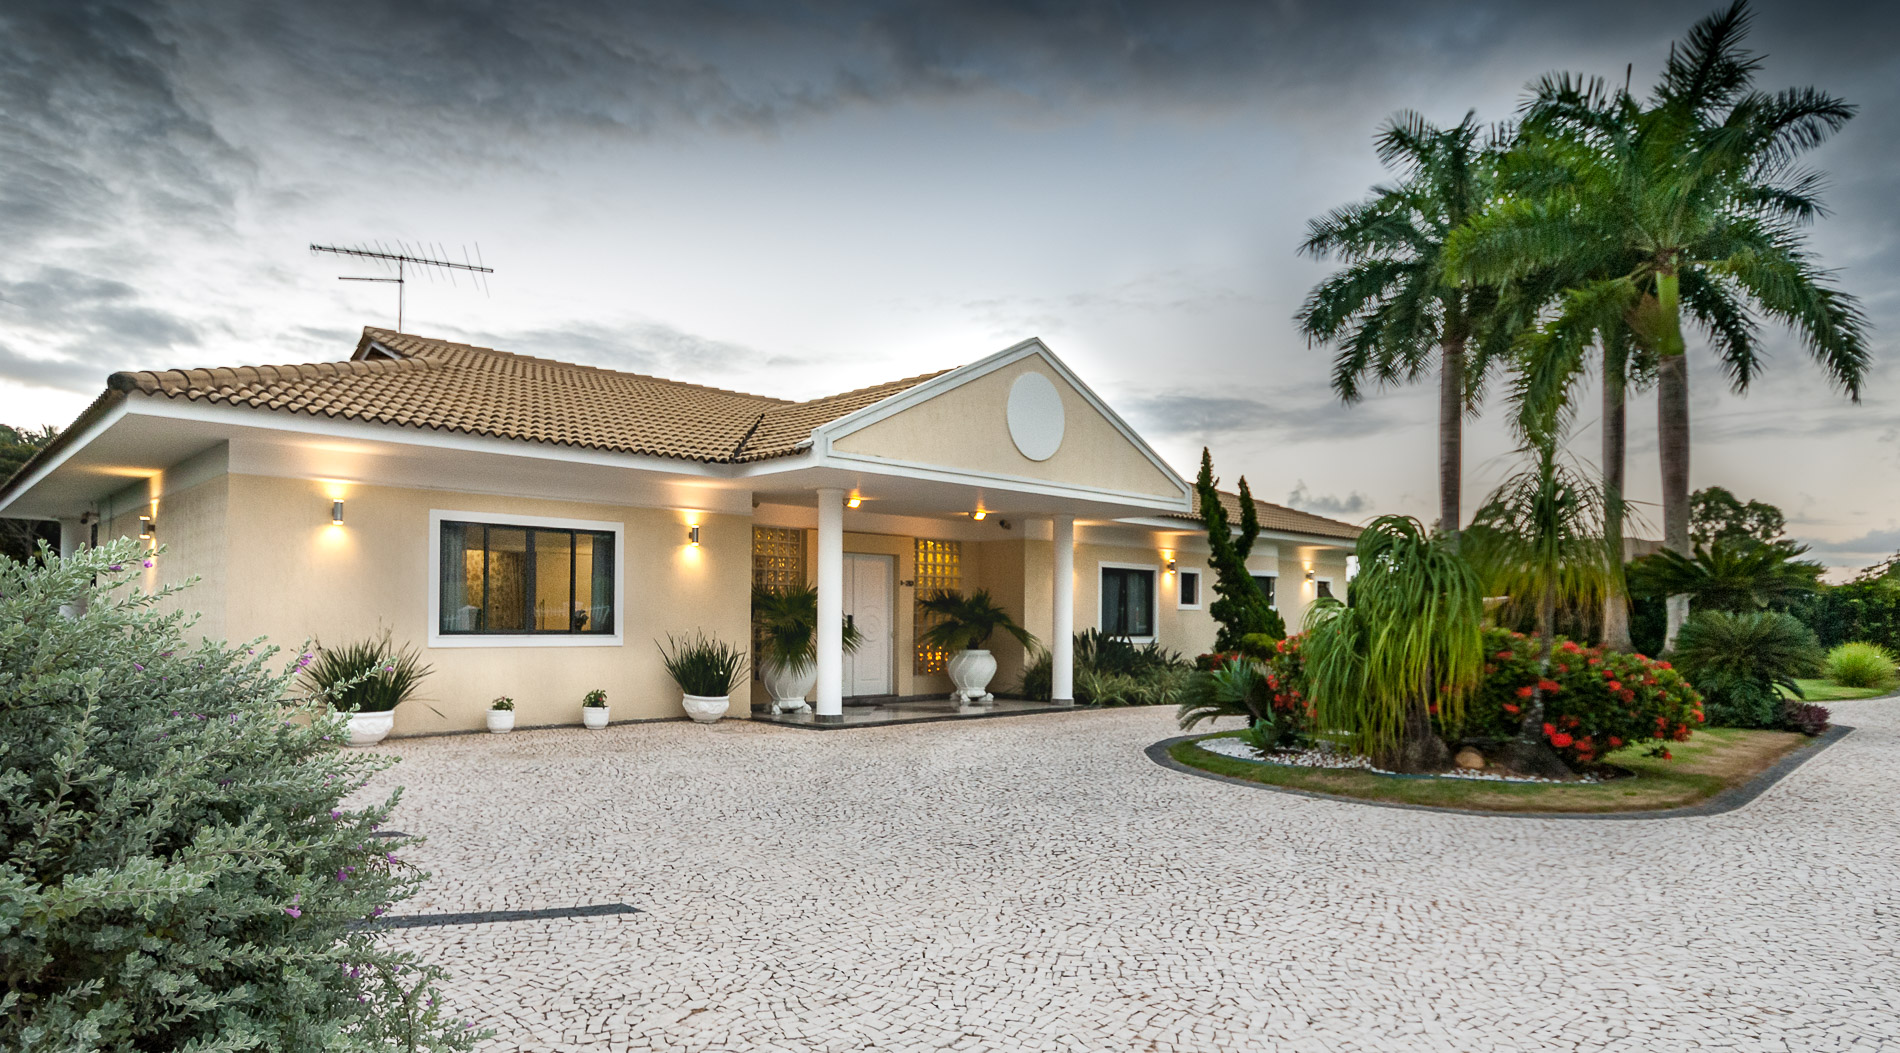 Luxury home for sale in condominio Encontro das Águas